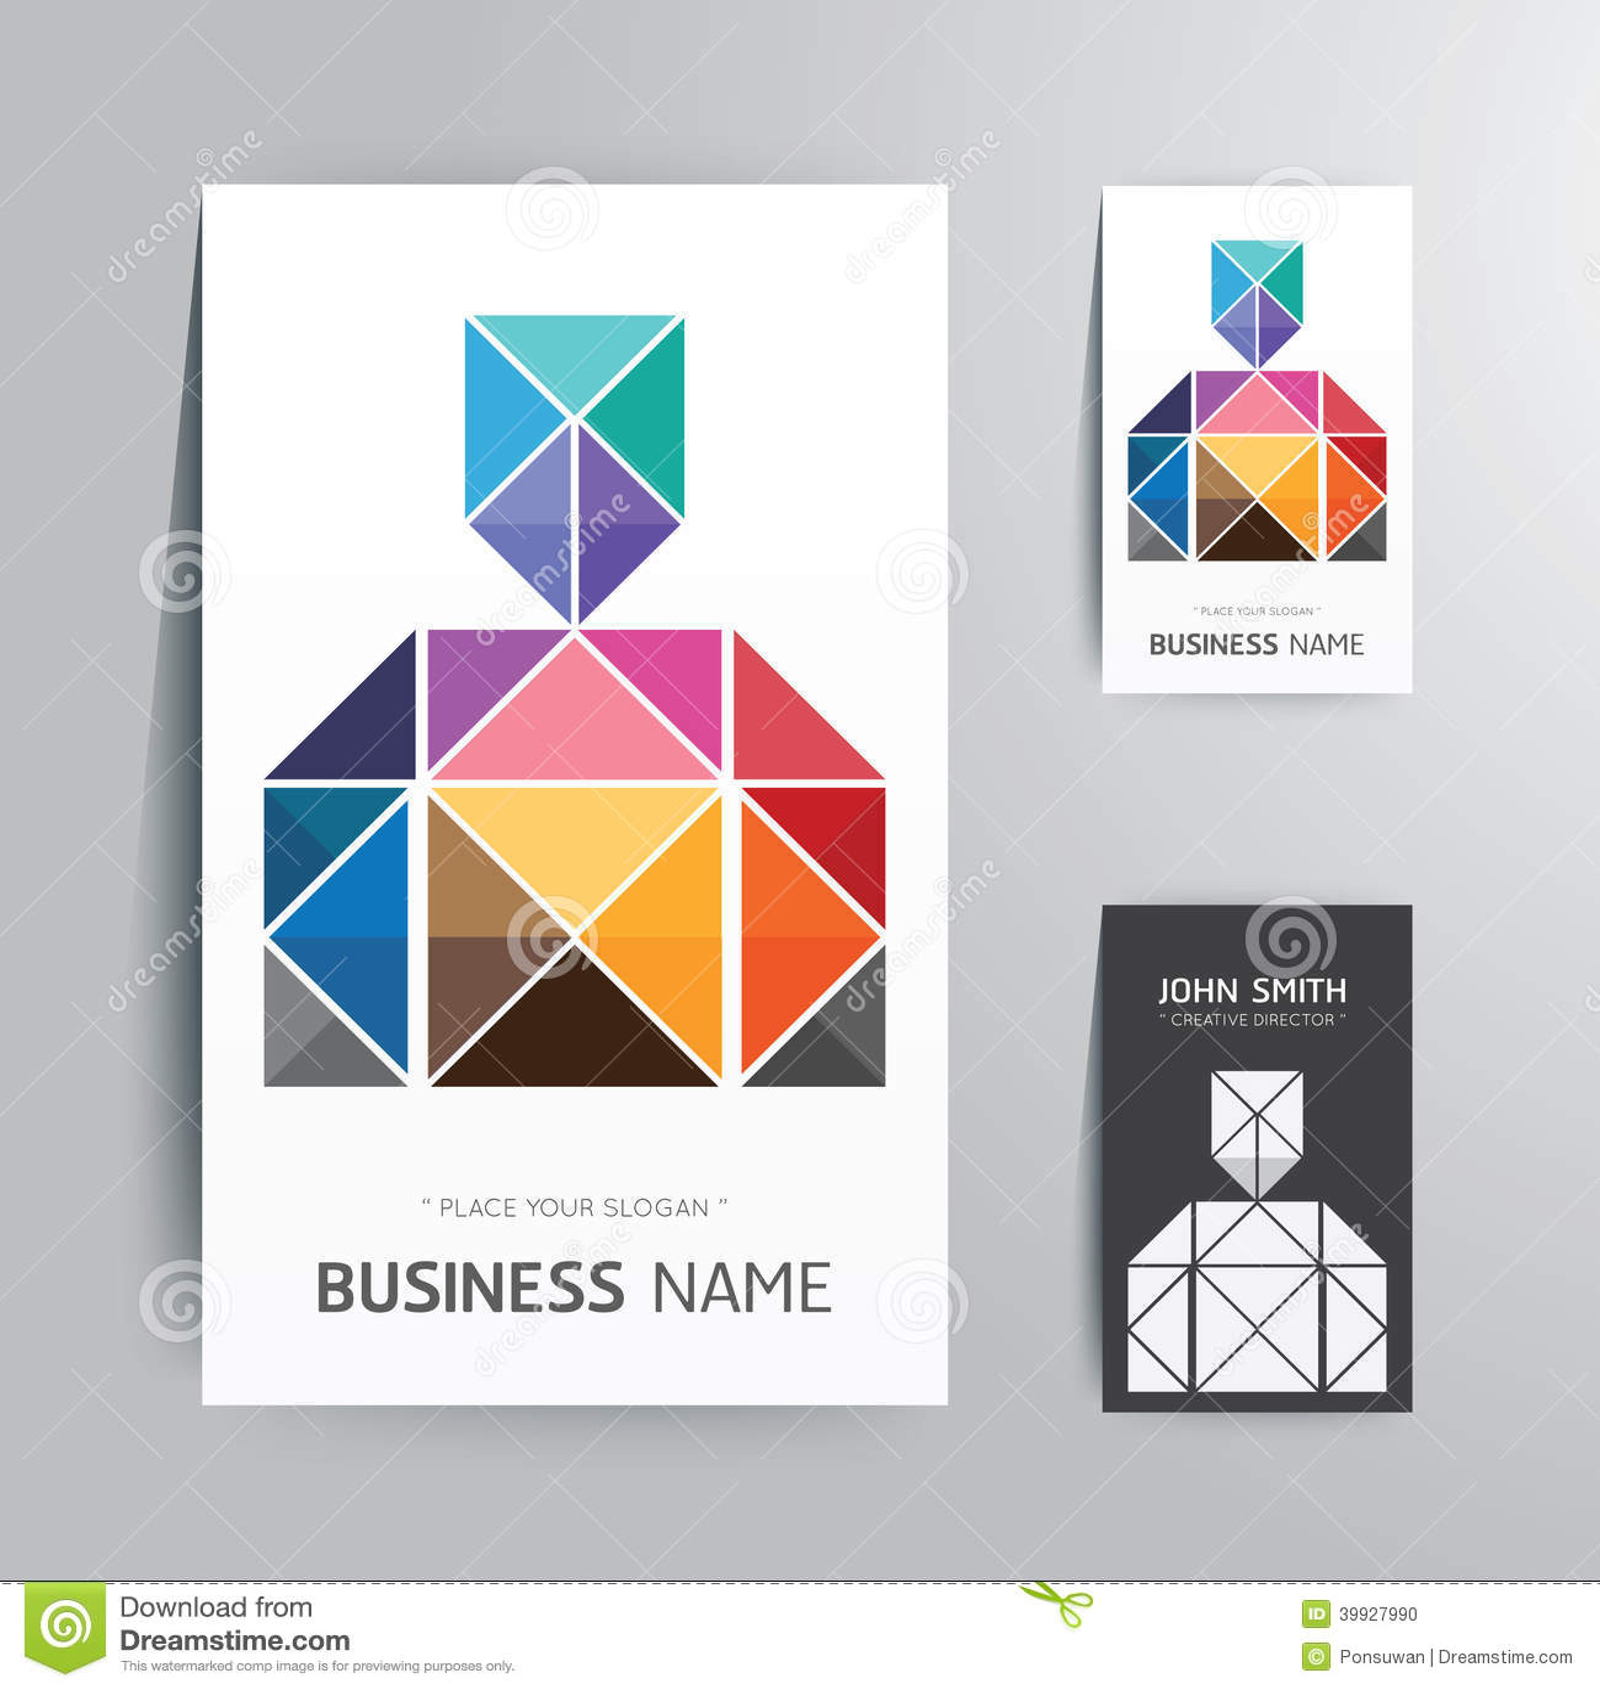 Modern creative business card man shape design stock vector modern creative business card man shape design magicingreecefo Choice Image